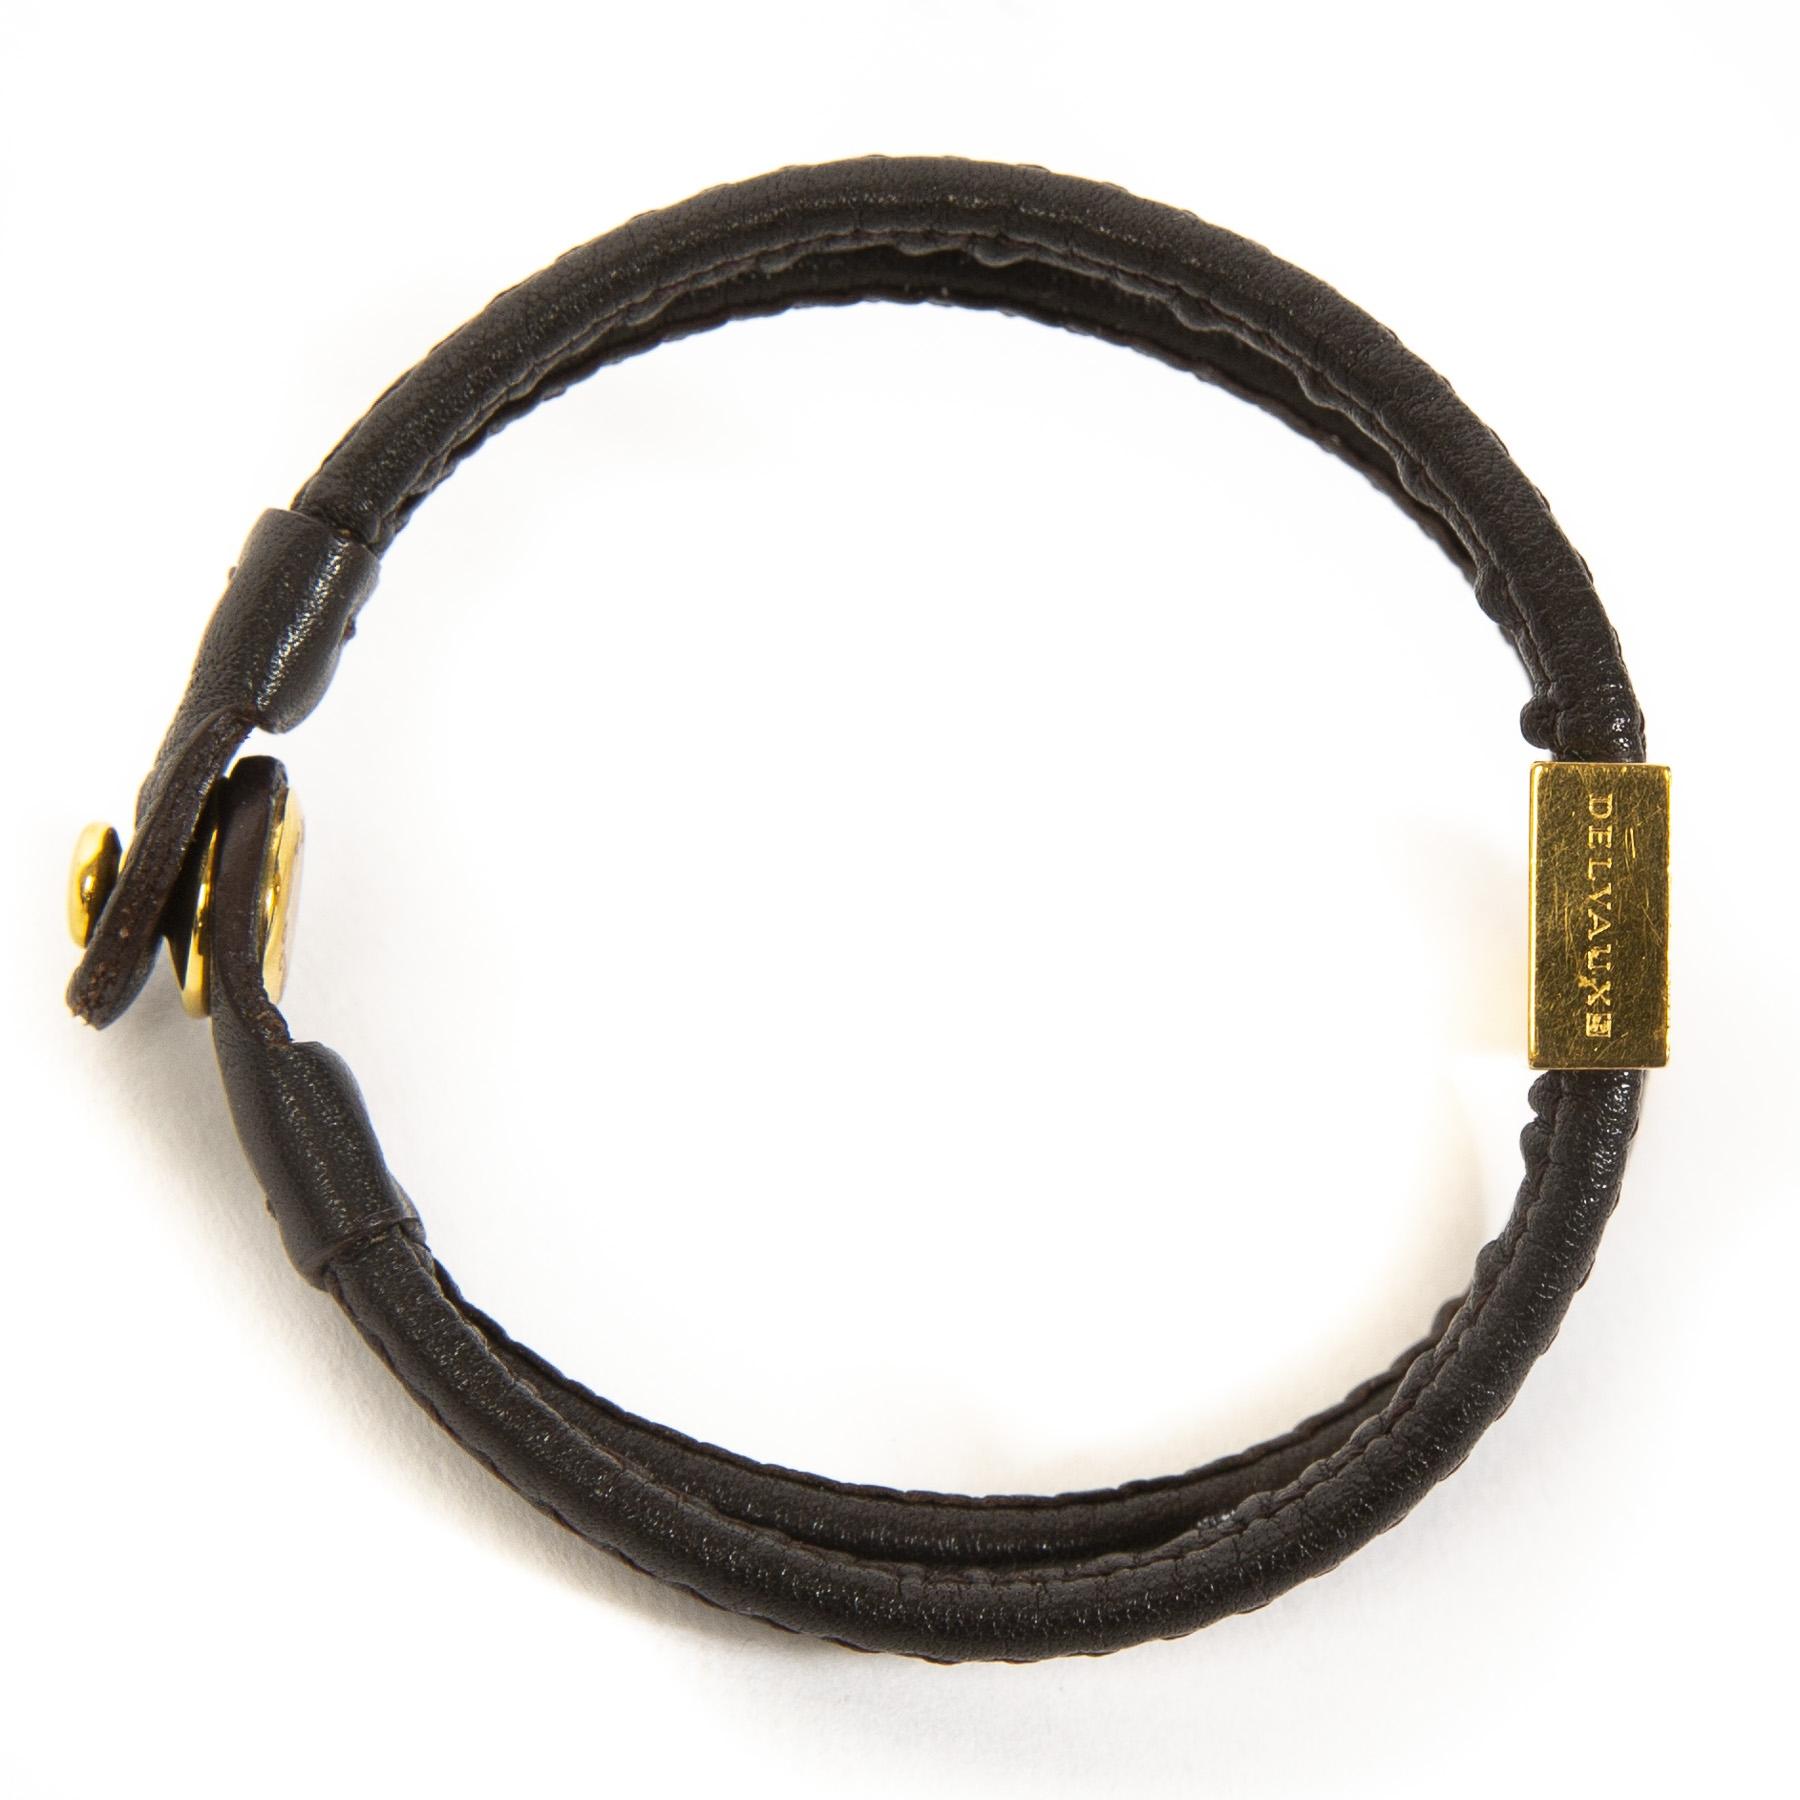 Delvaux Brown Déclic Bracelet. Buy authentic secondhand designer items from delvaux at labellov antwerp. Koop online tweedehands delvaux armband bij labellov antwerpen. veilige betaling, paiement sécurisé. Designer vintage.